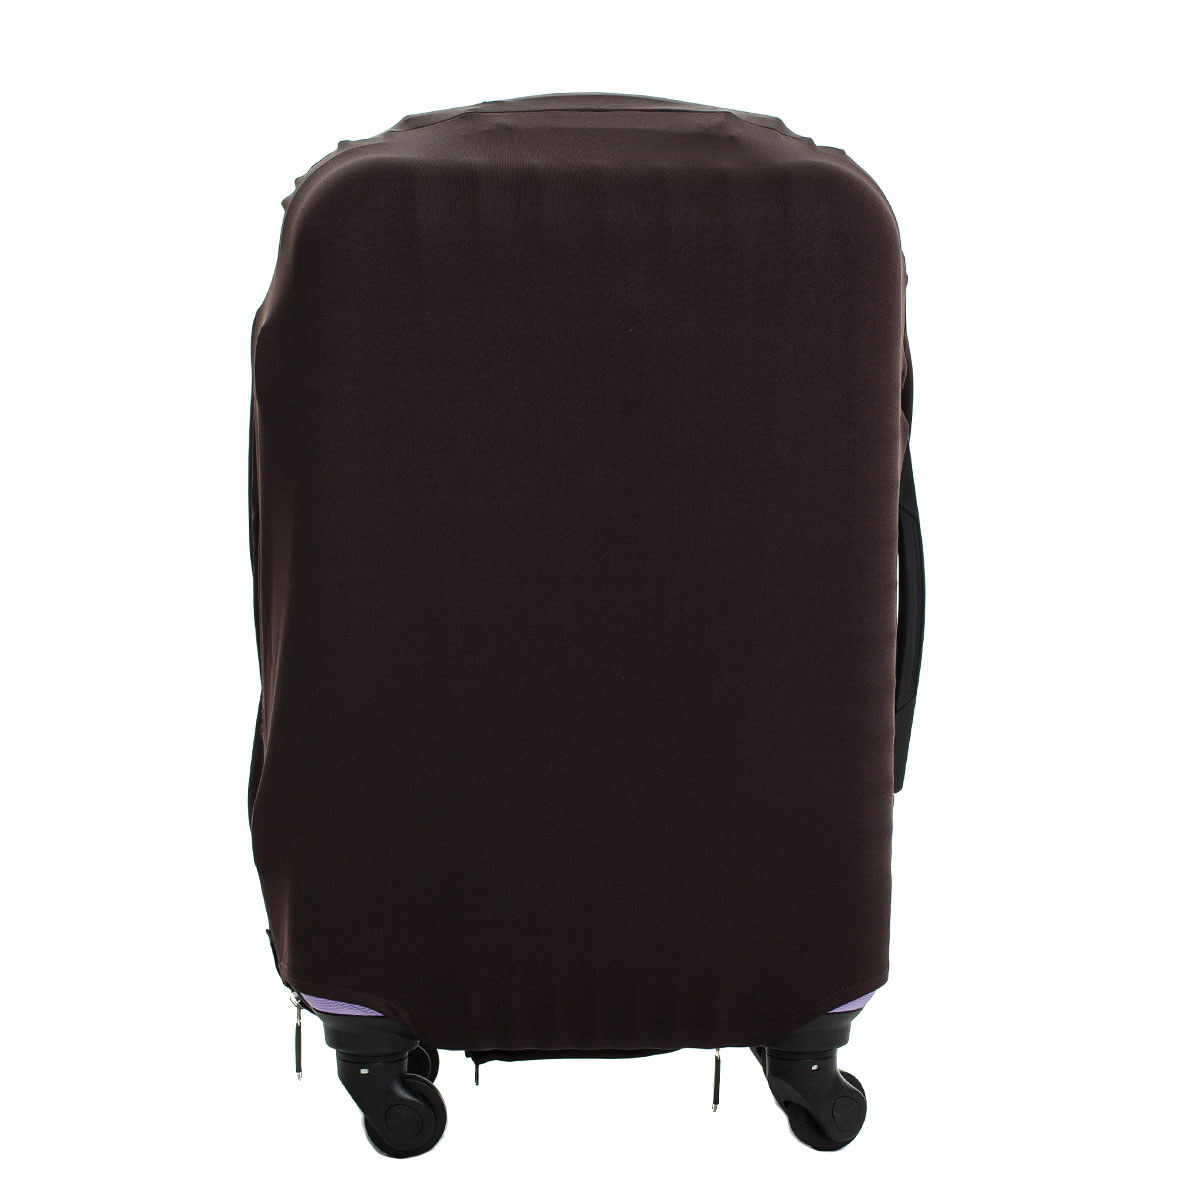 Чехол для чемодана S, IM чехол samsonite чехол для чемодана 75 см travel accessor v